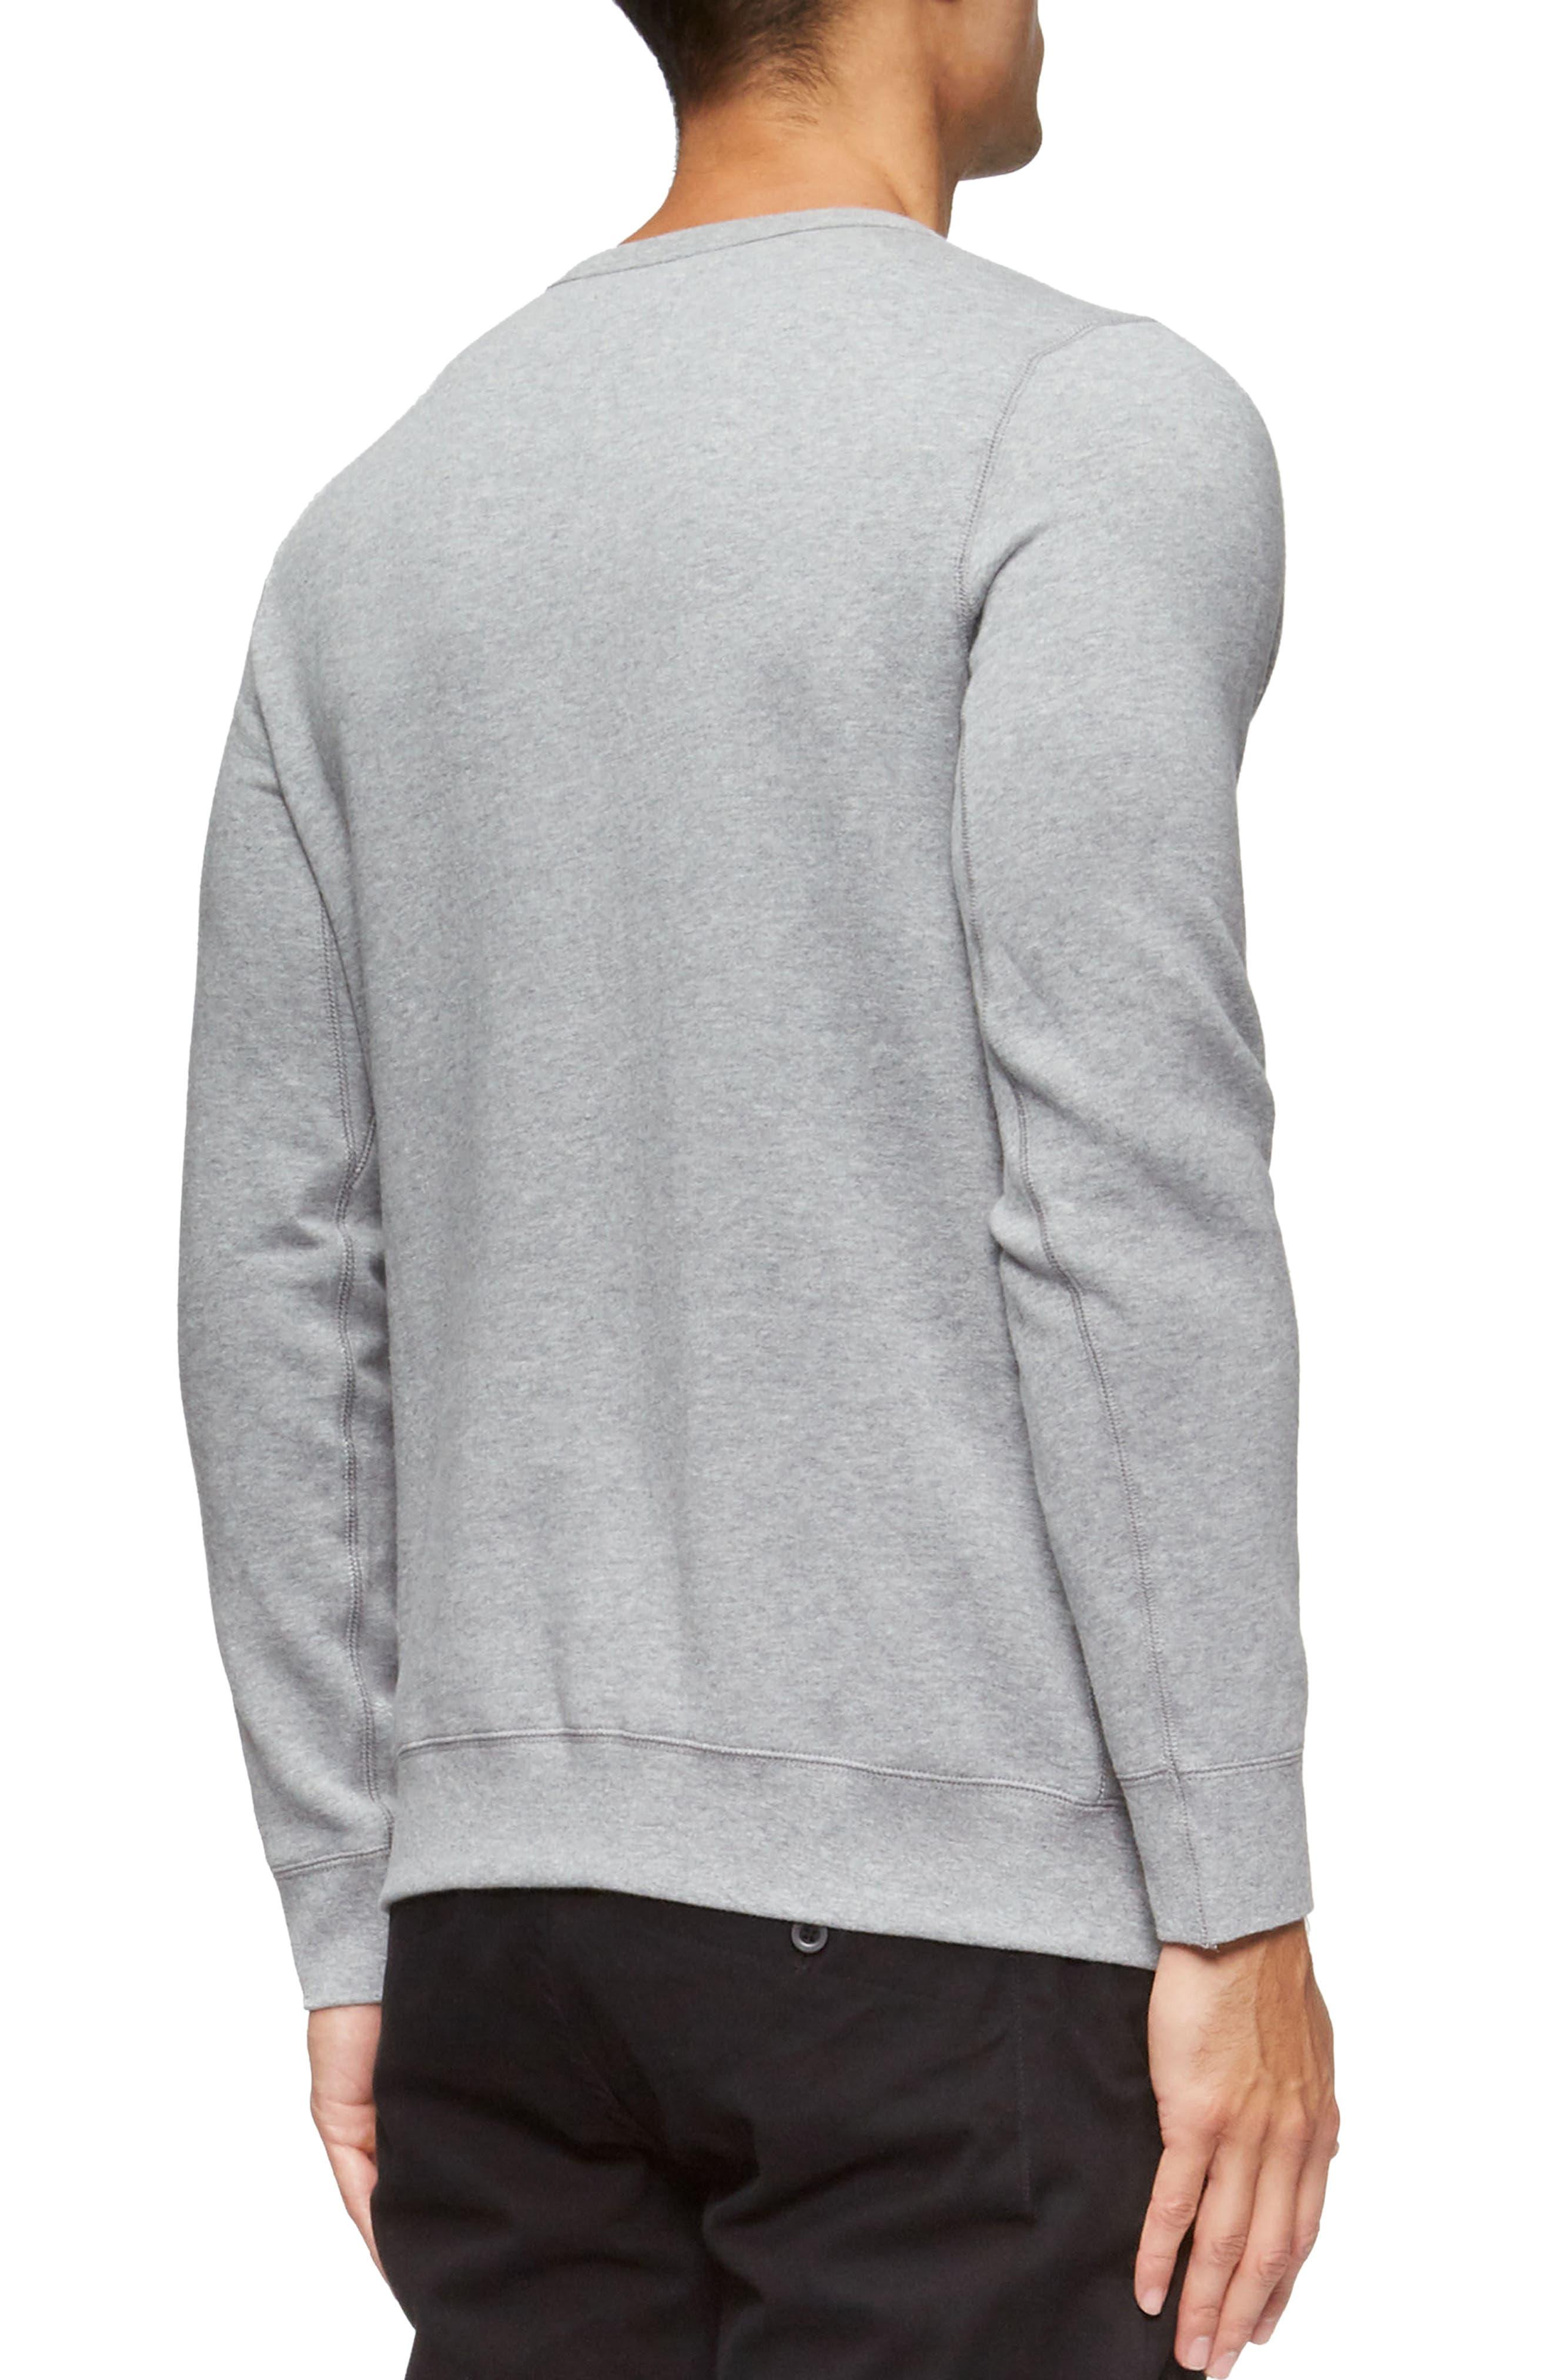 Marina Sweatshirt,                             Alternate thumbnail 2, color,                             Heather Grey